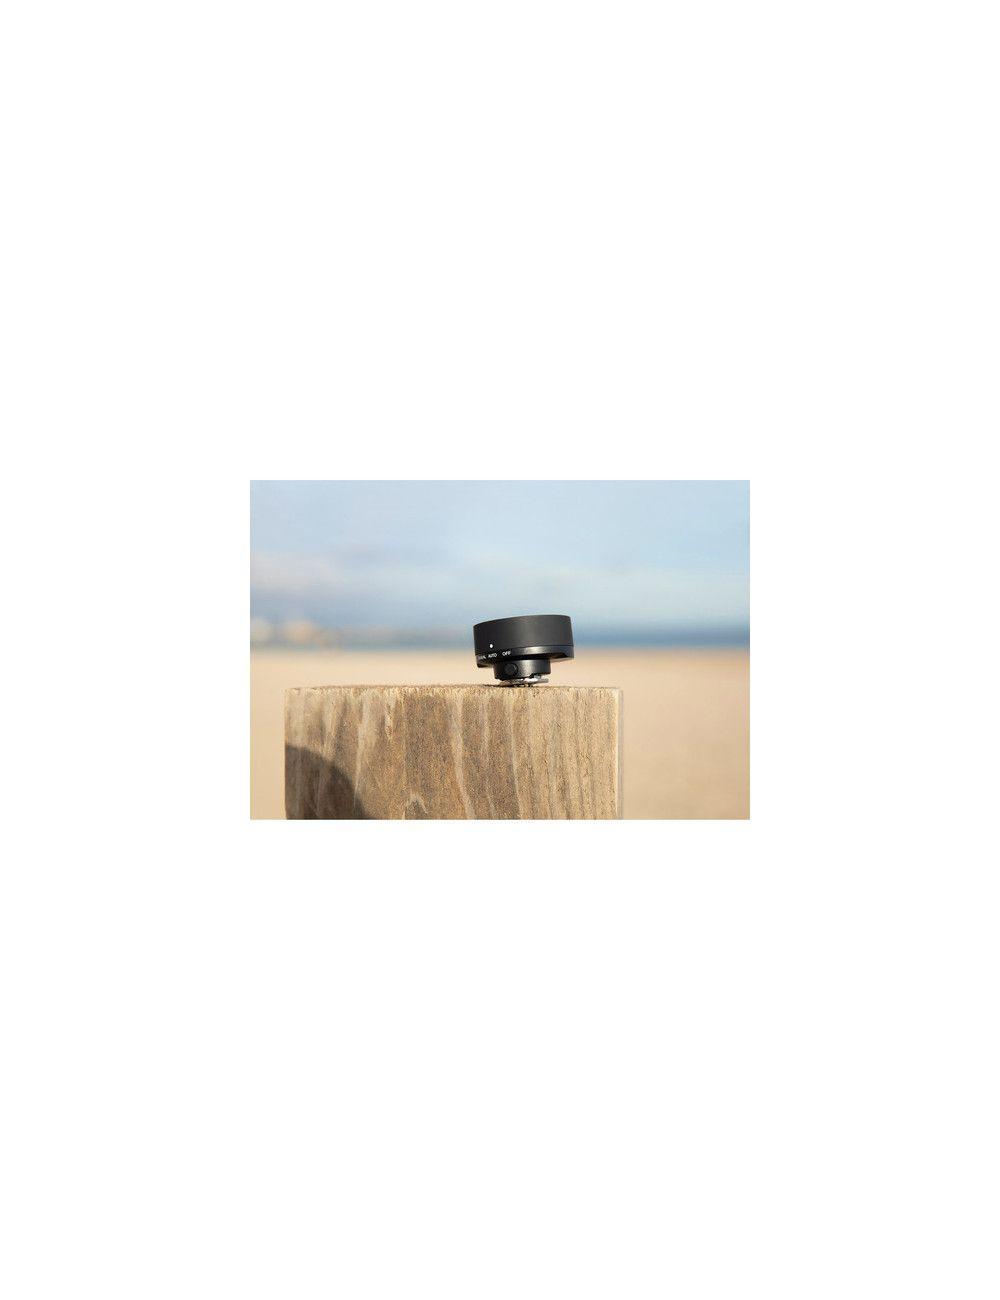 Tascam TM-AM2 - Brazo de soporte de micrófono en Chile www.apertura.cl